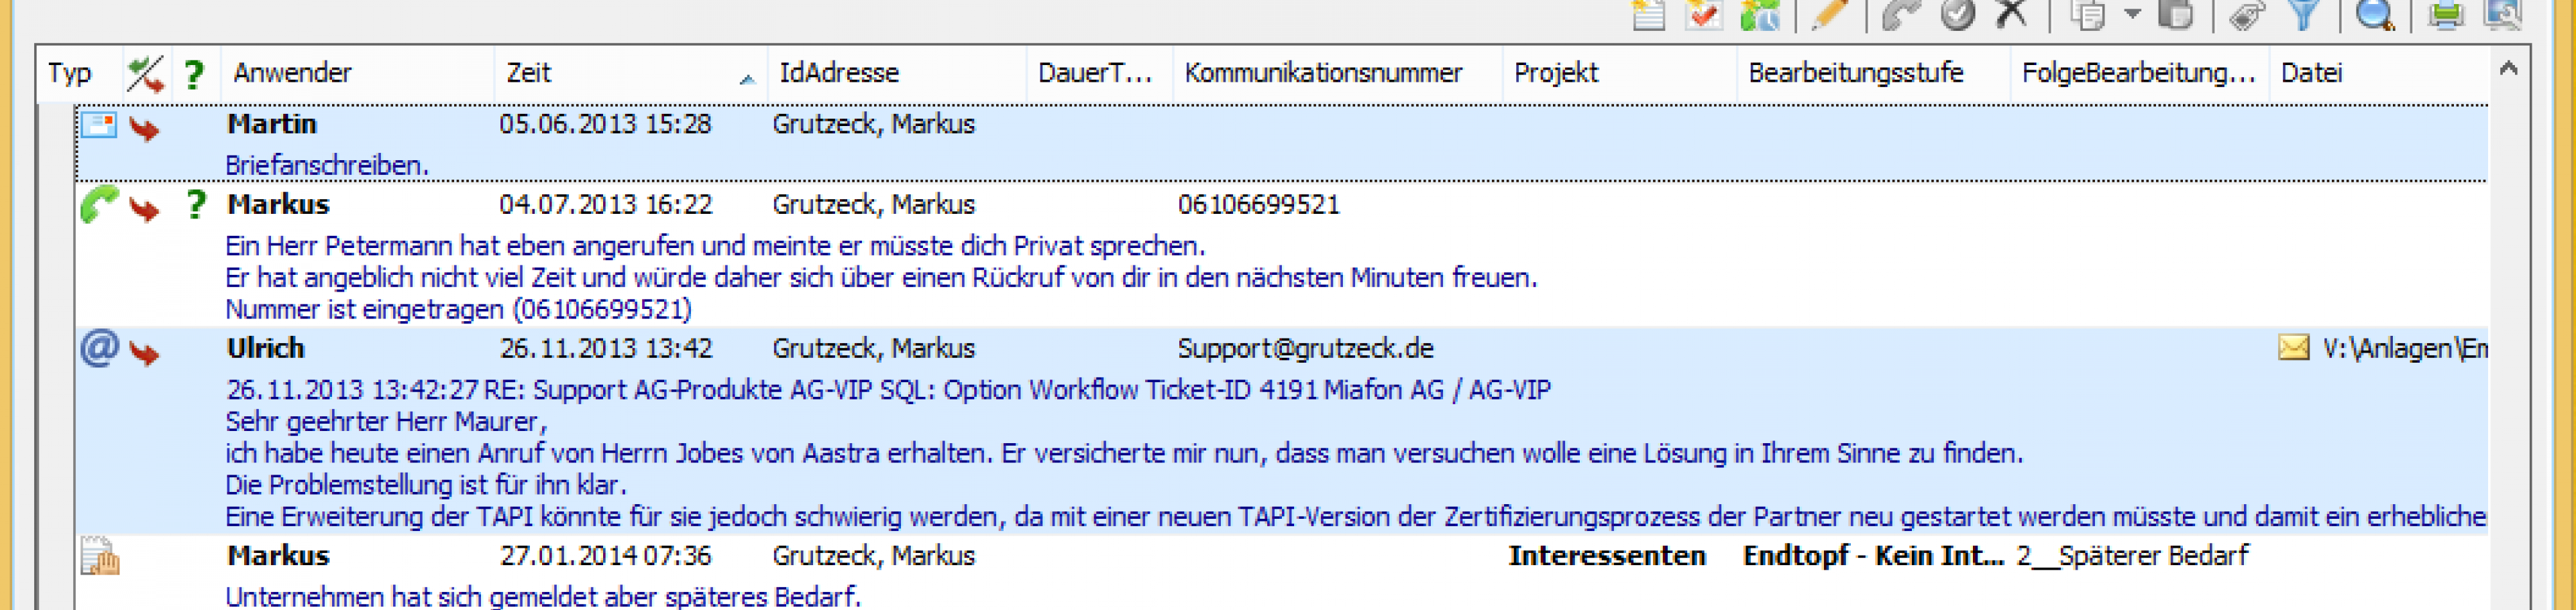 CRM Software AG-VIP SQL - Kontakthistorie